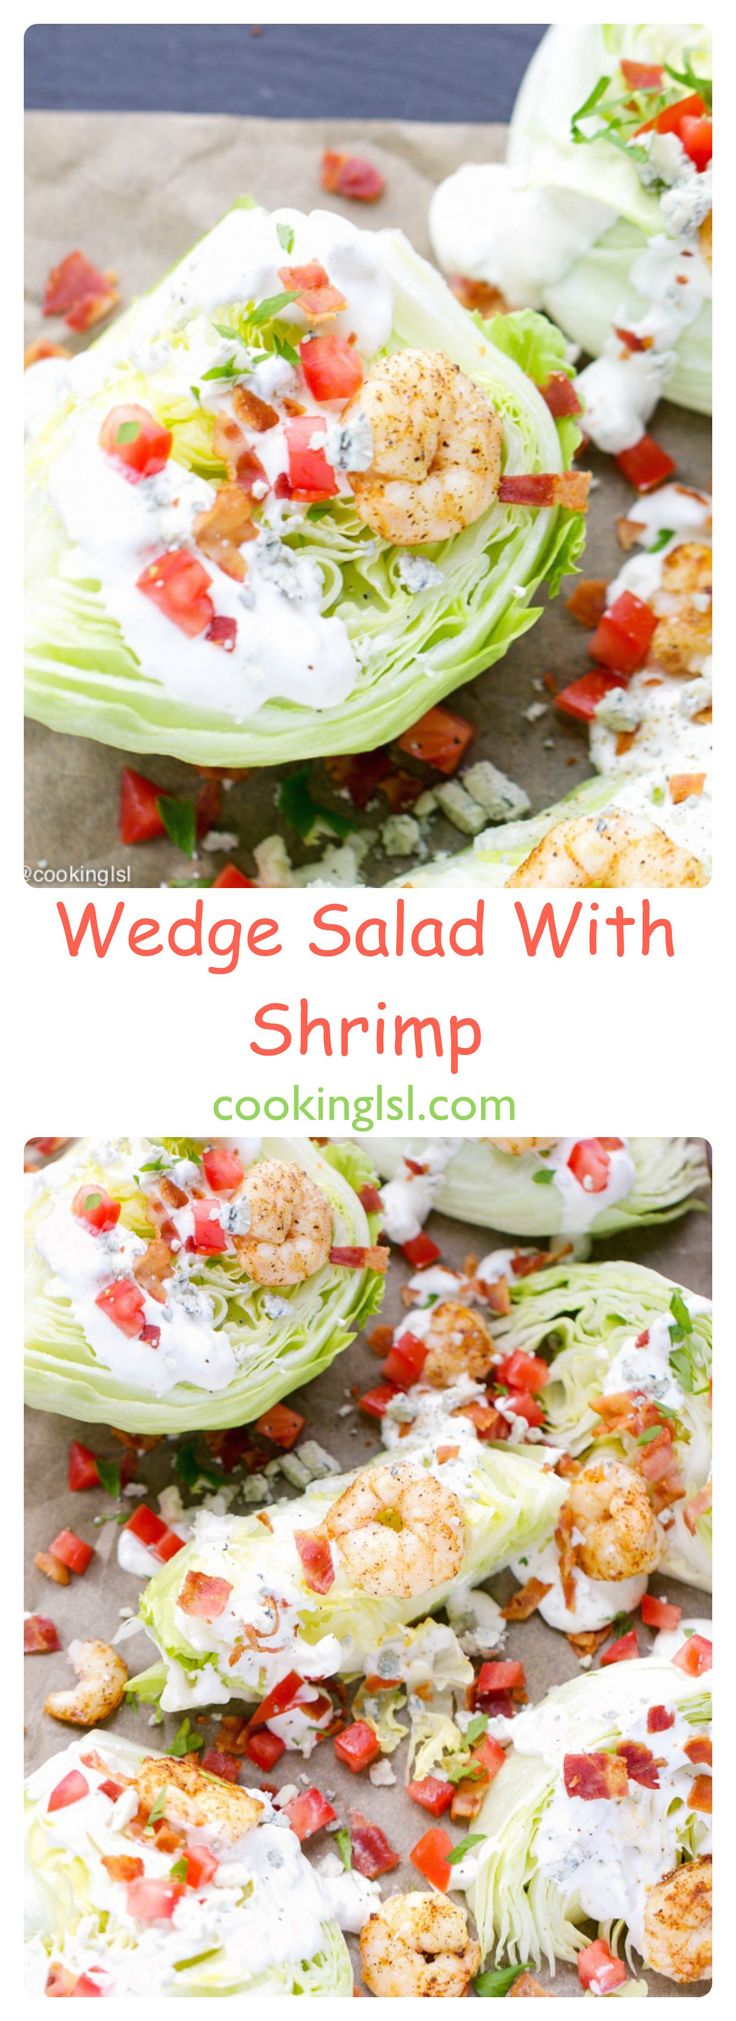 gulf-shrimp-wedge-salad-sizzlefish-blue-cheese